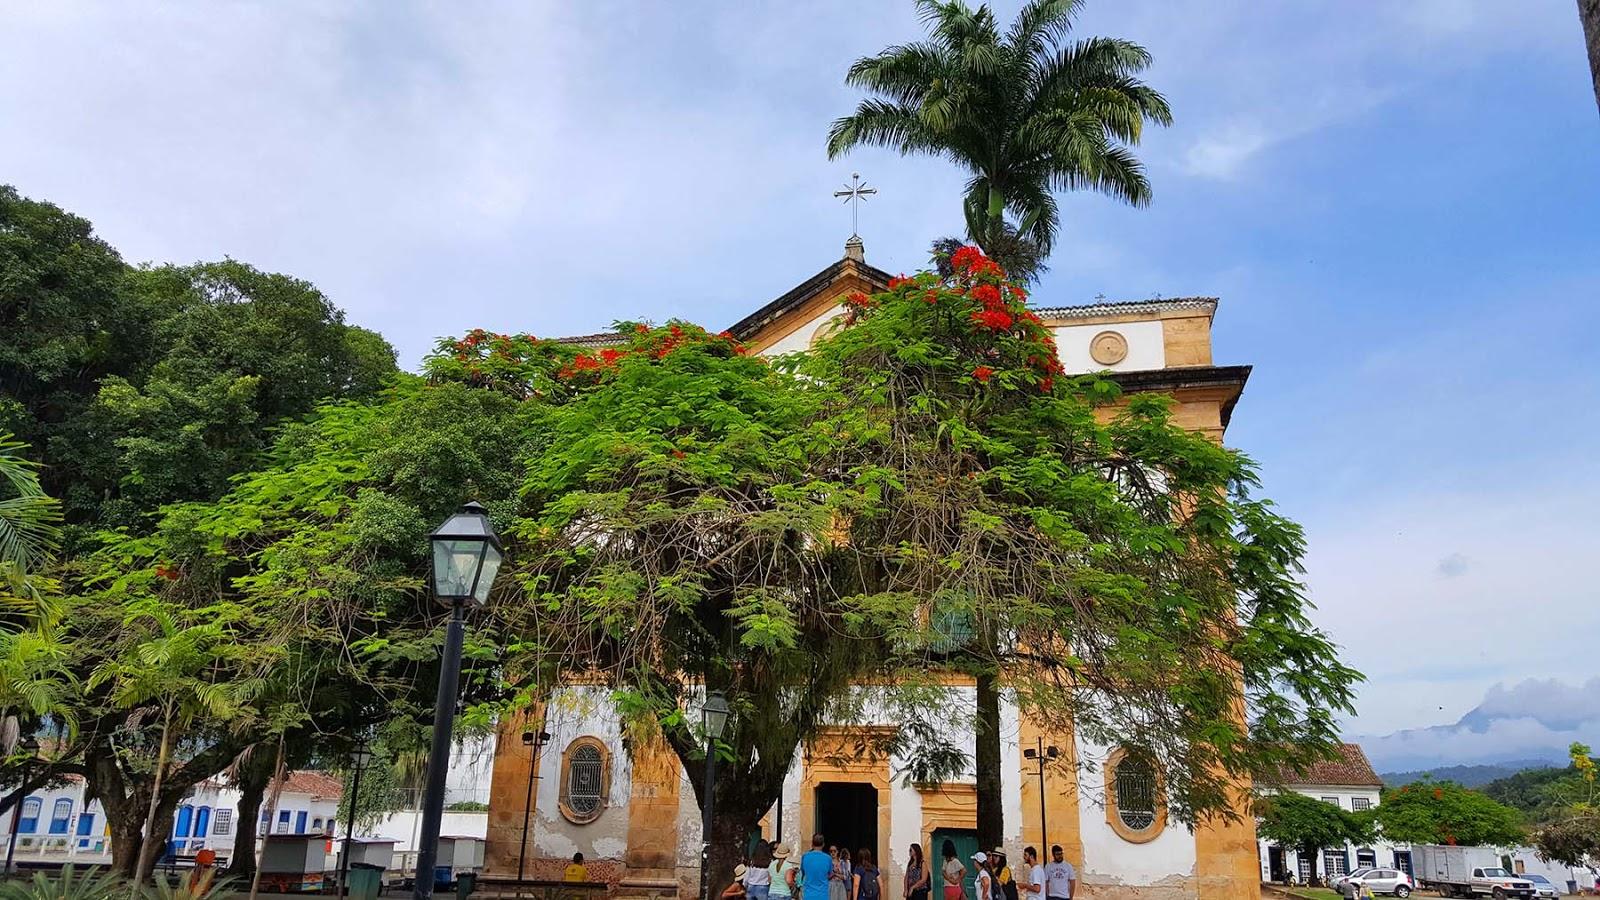 Igreja Nossa Senhora dos Remédios, Paraty.